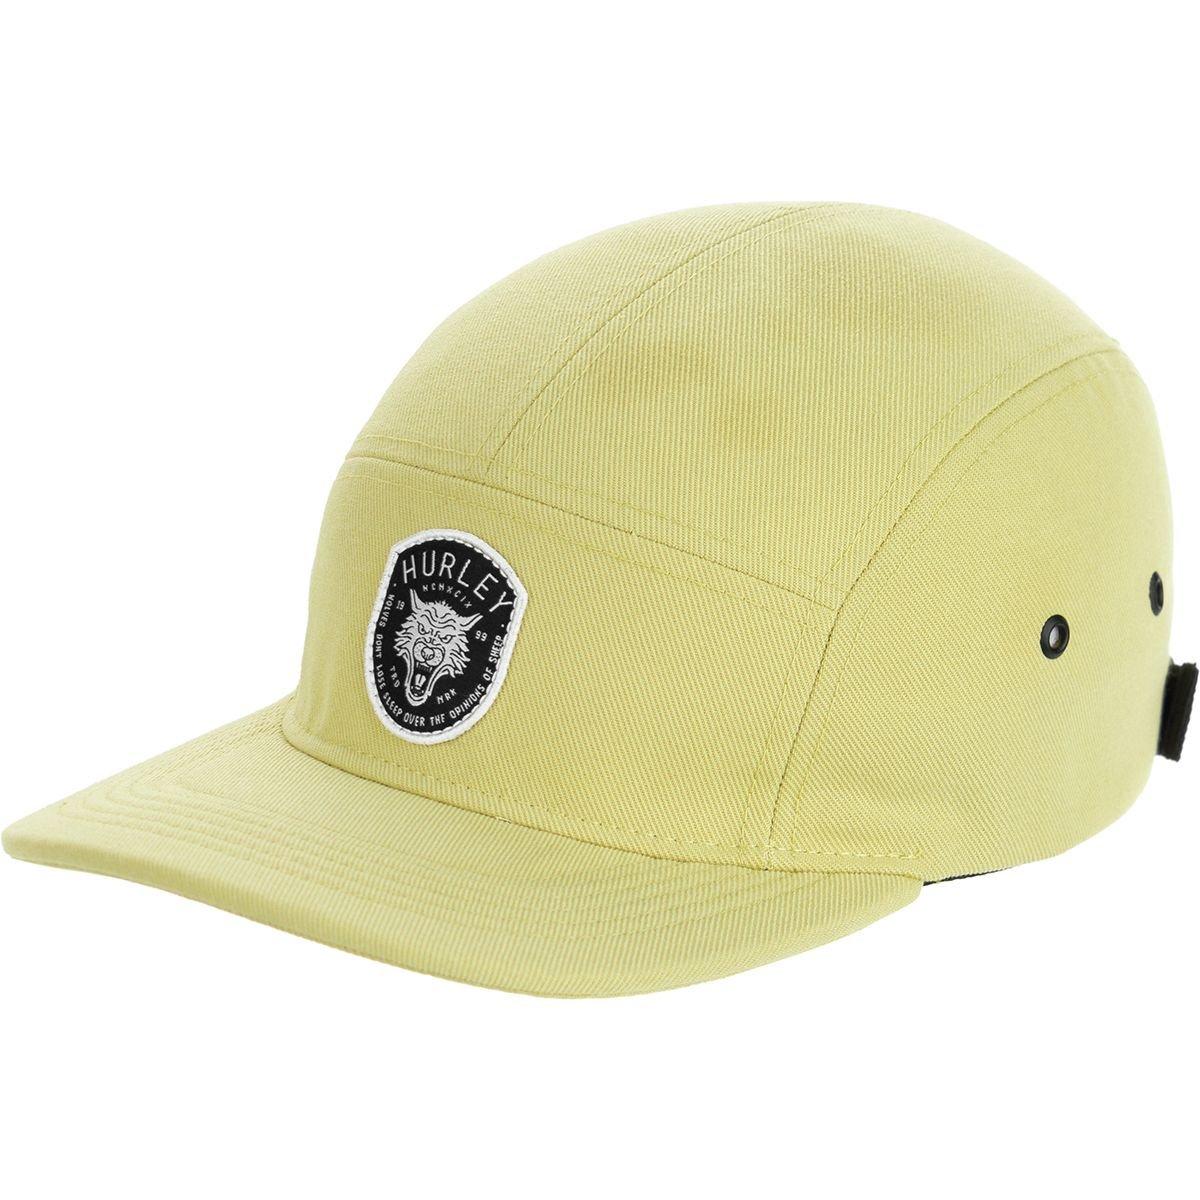 Hurley 892038 Mens Coastal Wolf Hat Clothing Nikewallowashoeexplodedviewdiagramjpg